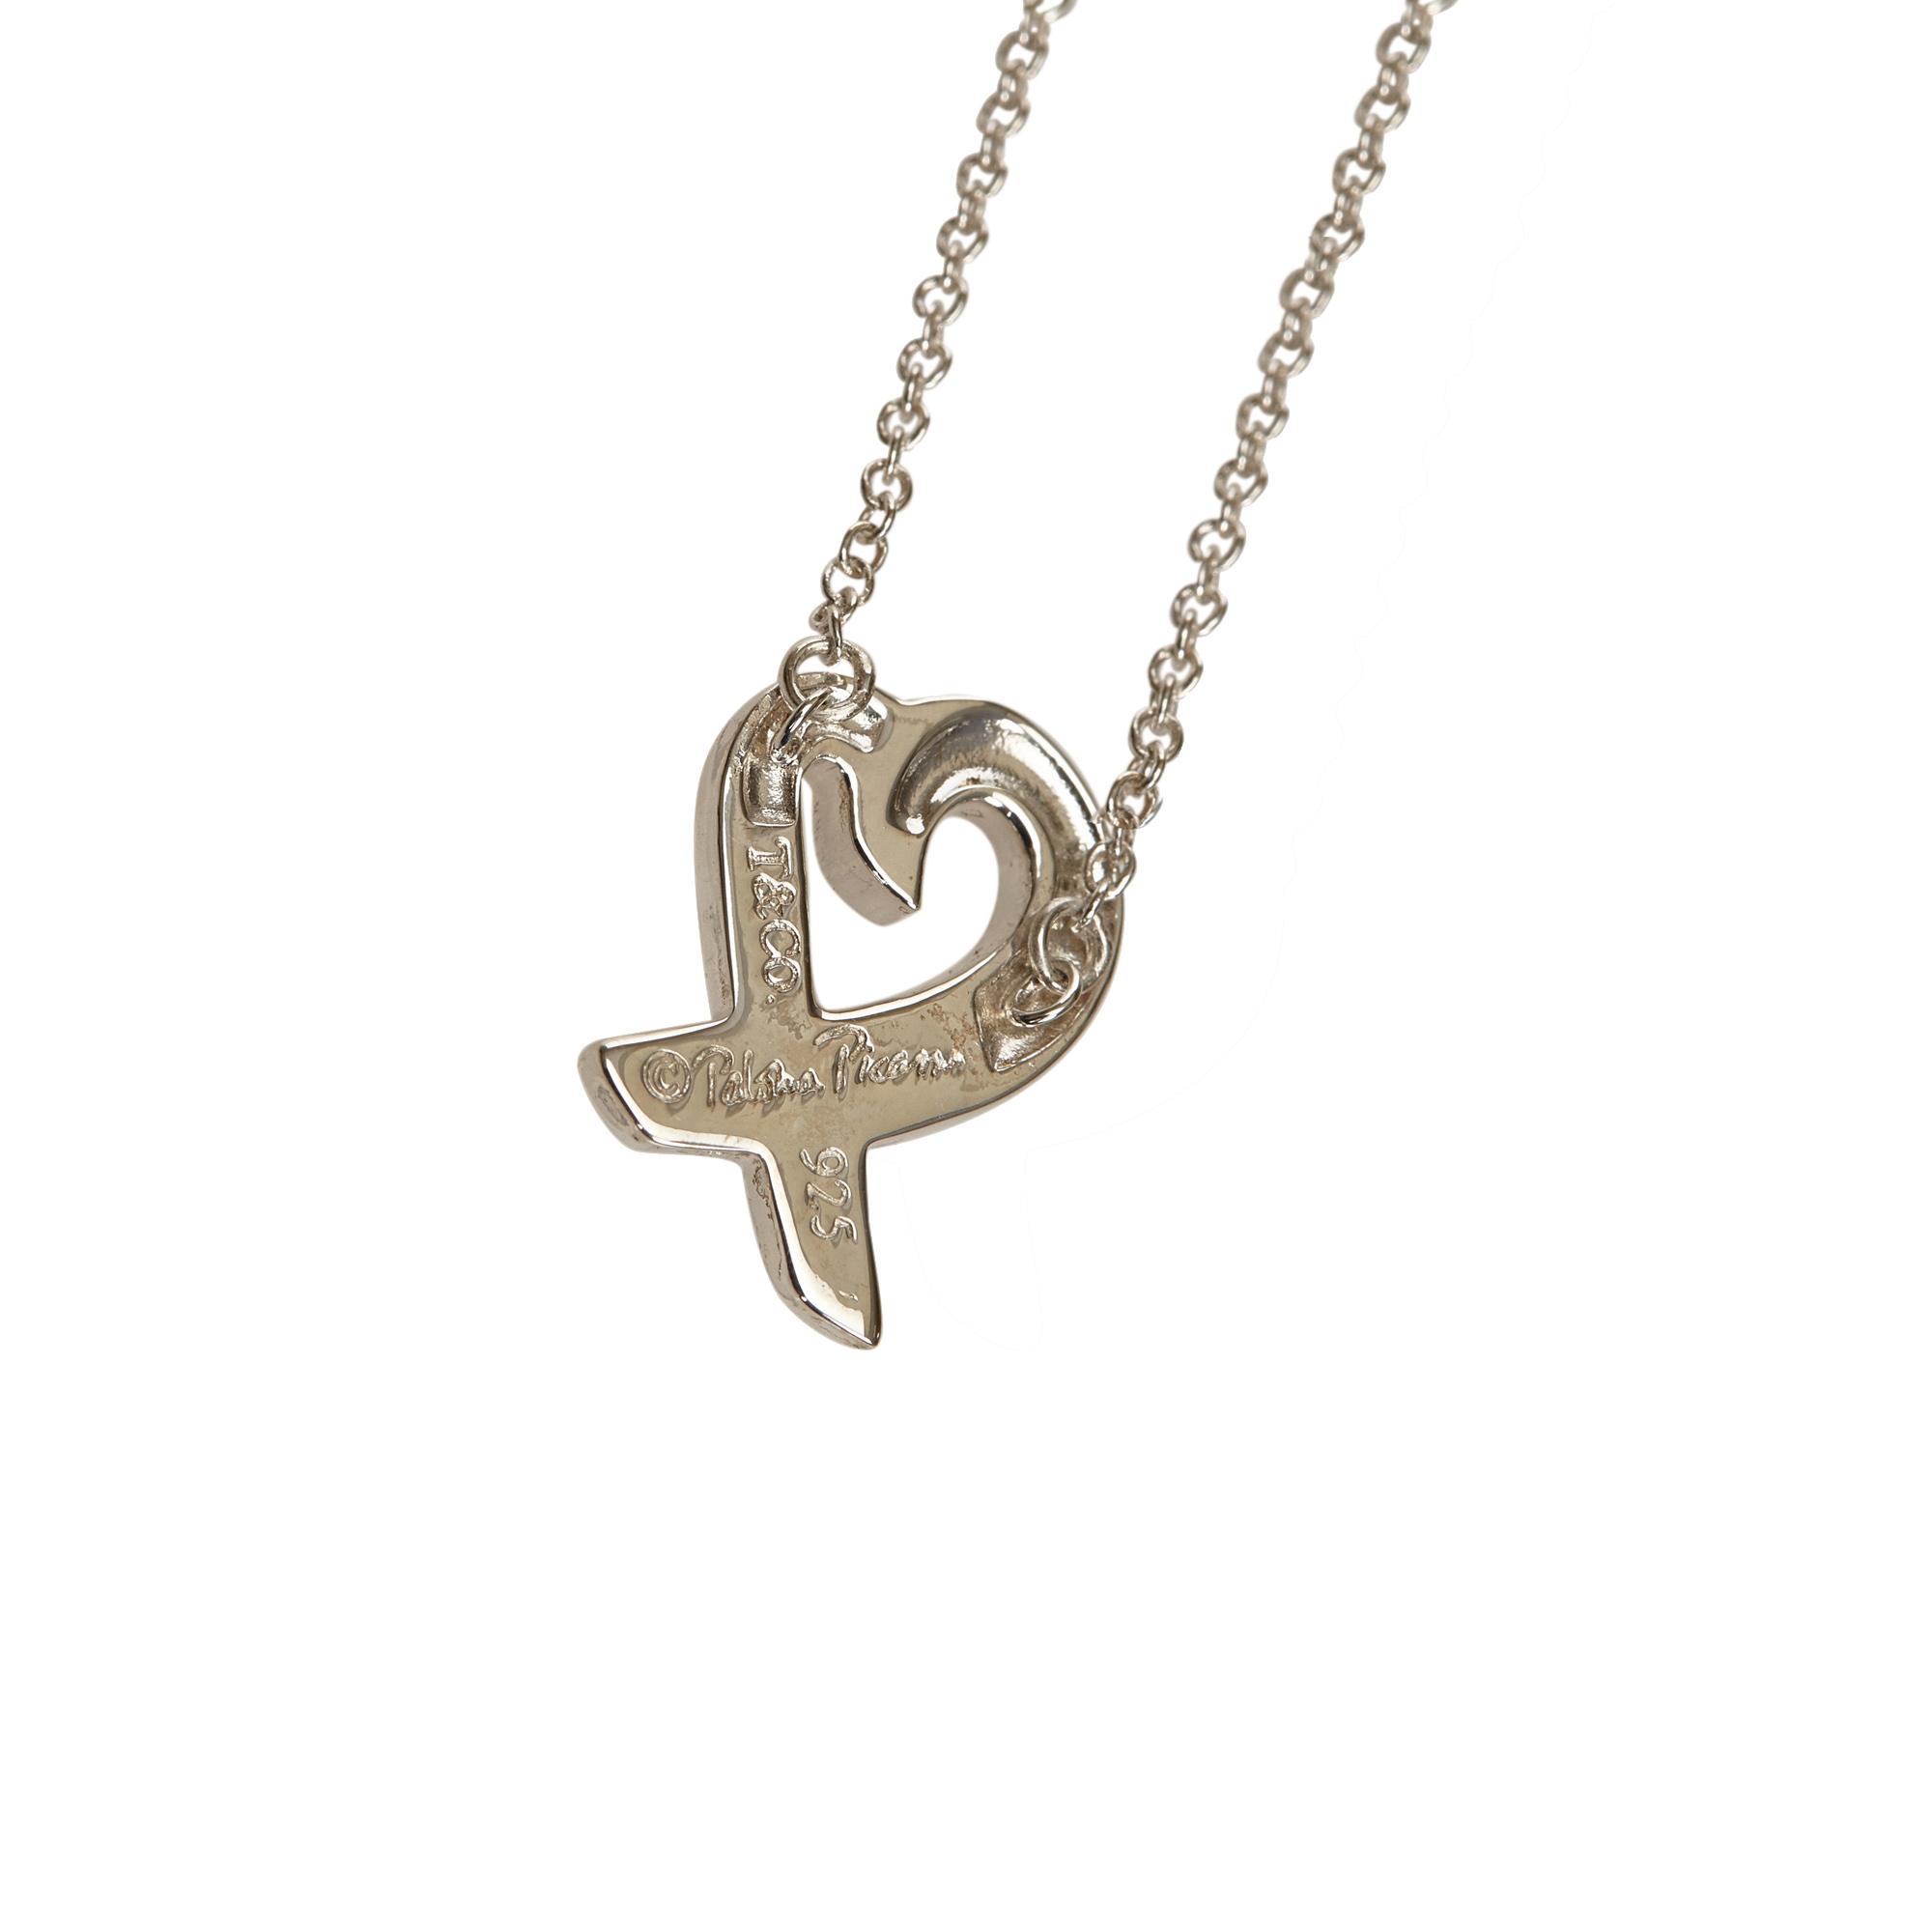 Tiffany co paloma picasso loving heart silver pendant necklace paloma picasso loving heart silver pendant necklace nextprev prevnext aloadofball Gallery